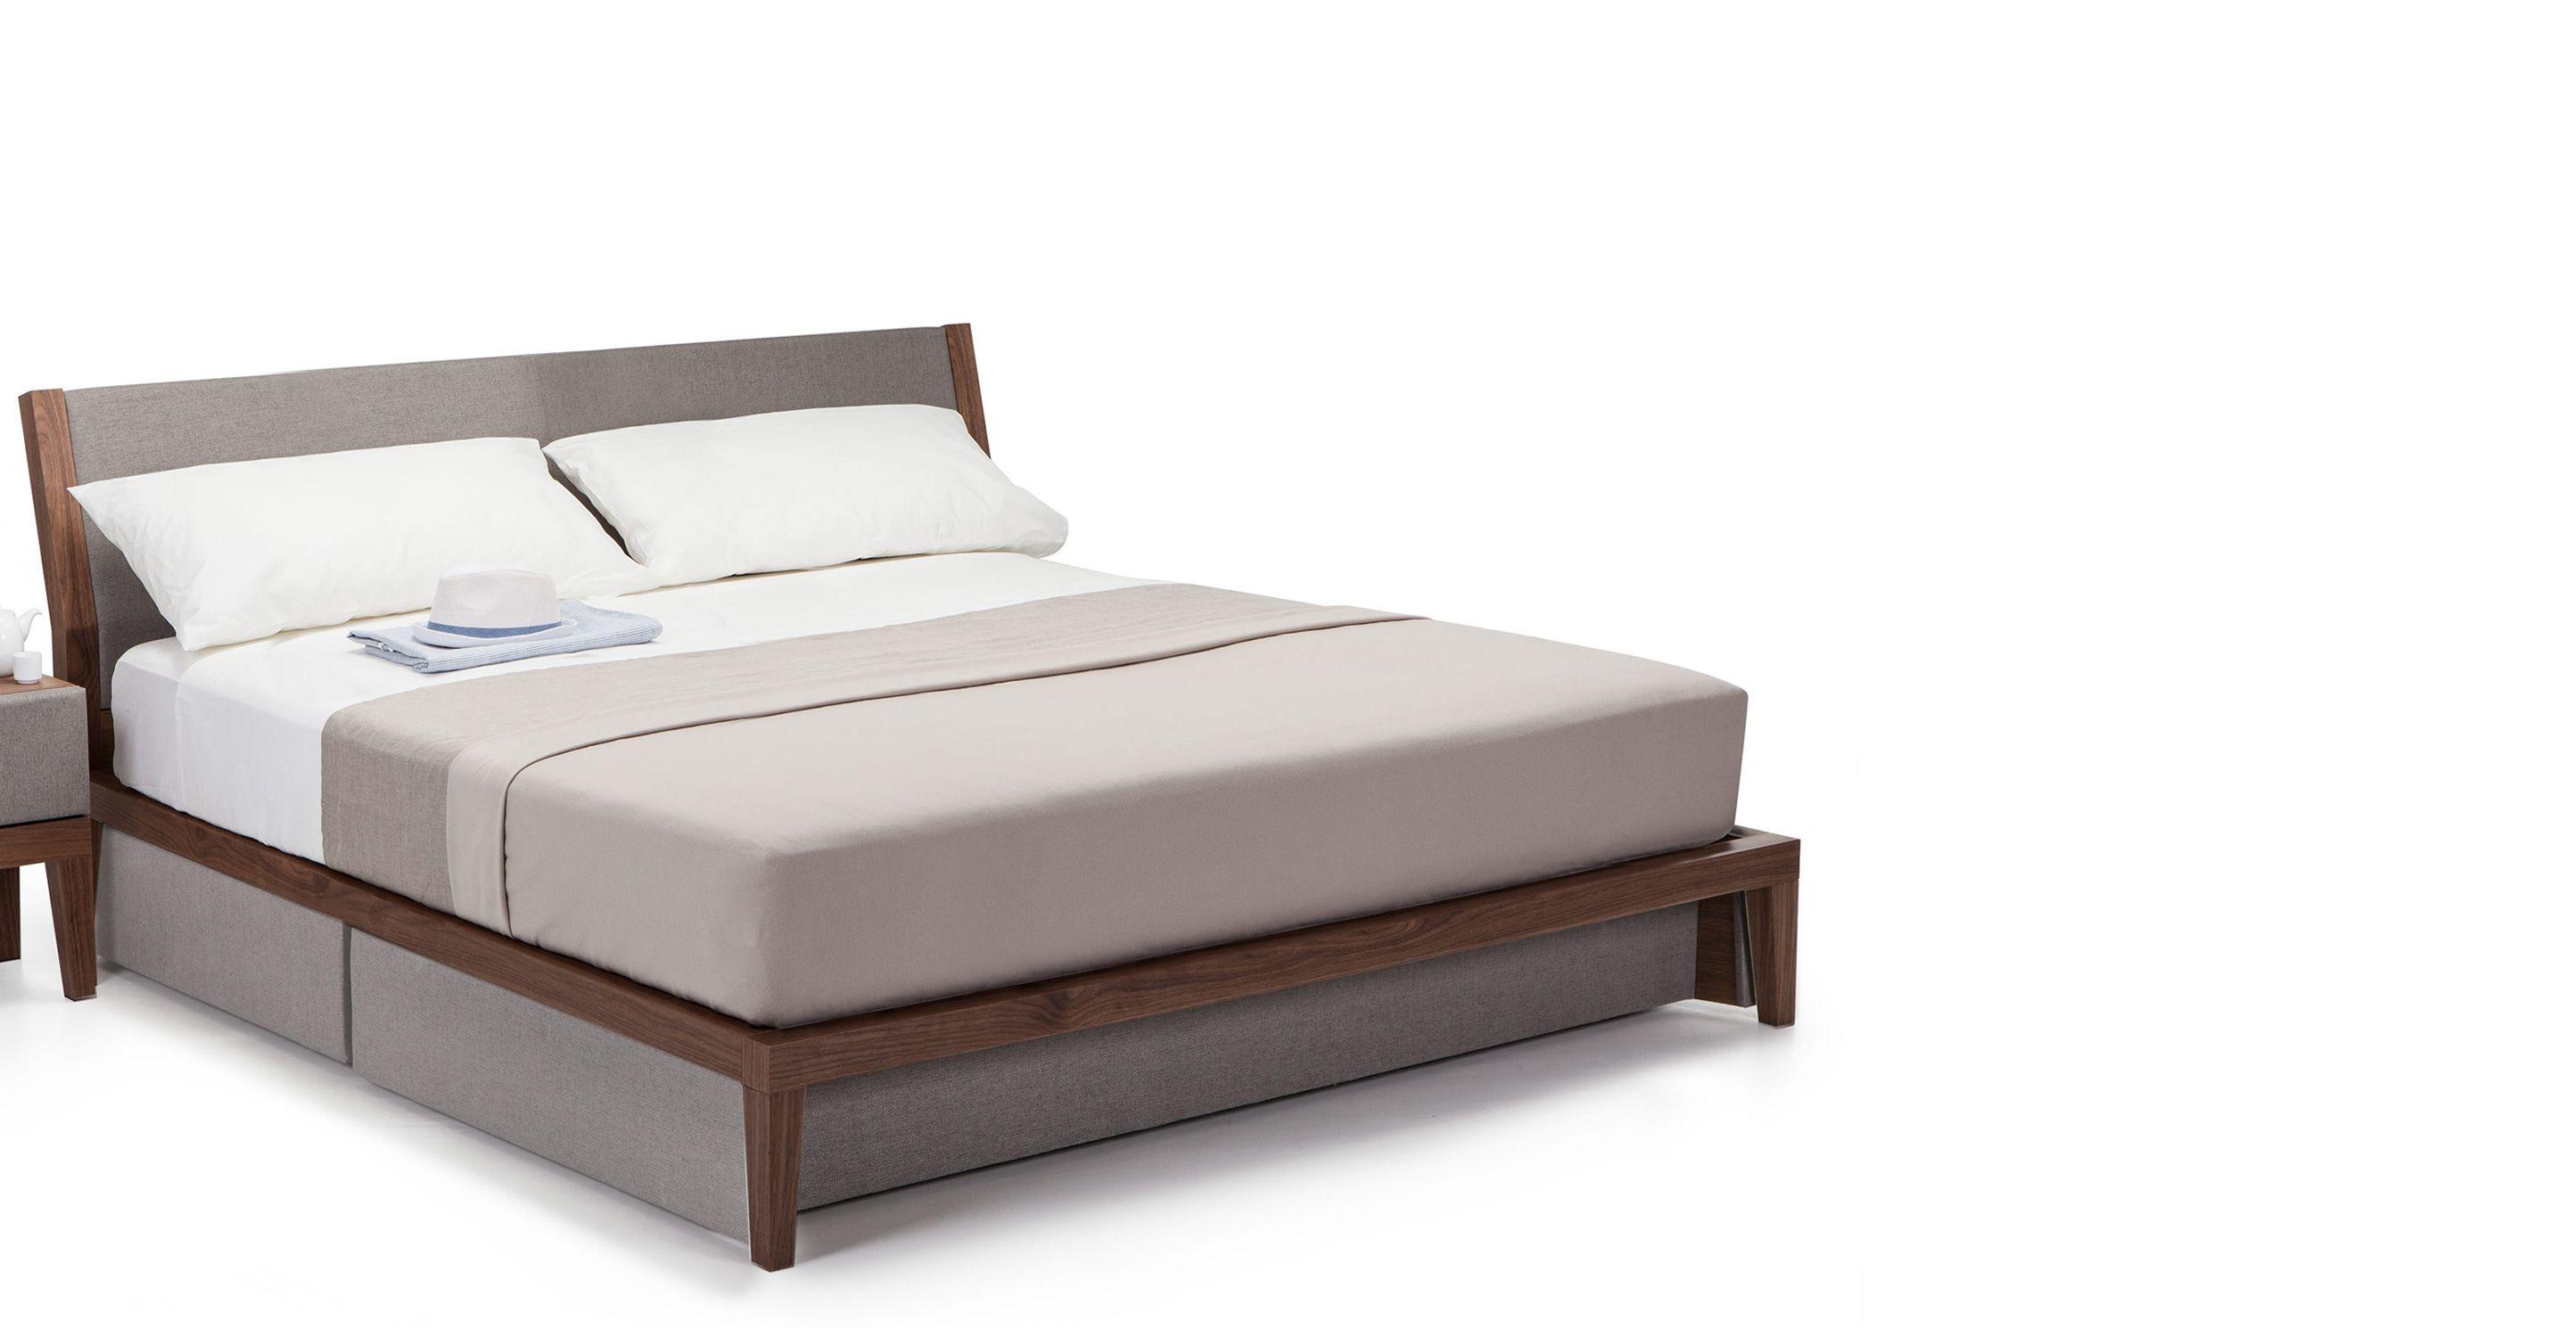 lansdowne kingsize bed with storage walnut and heron grey